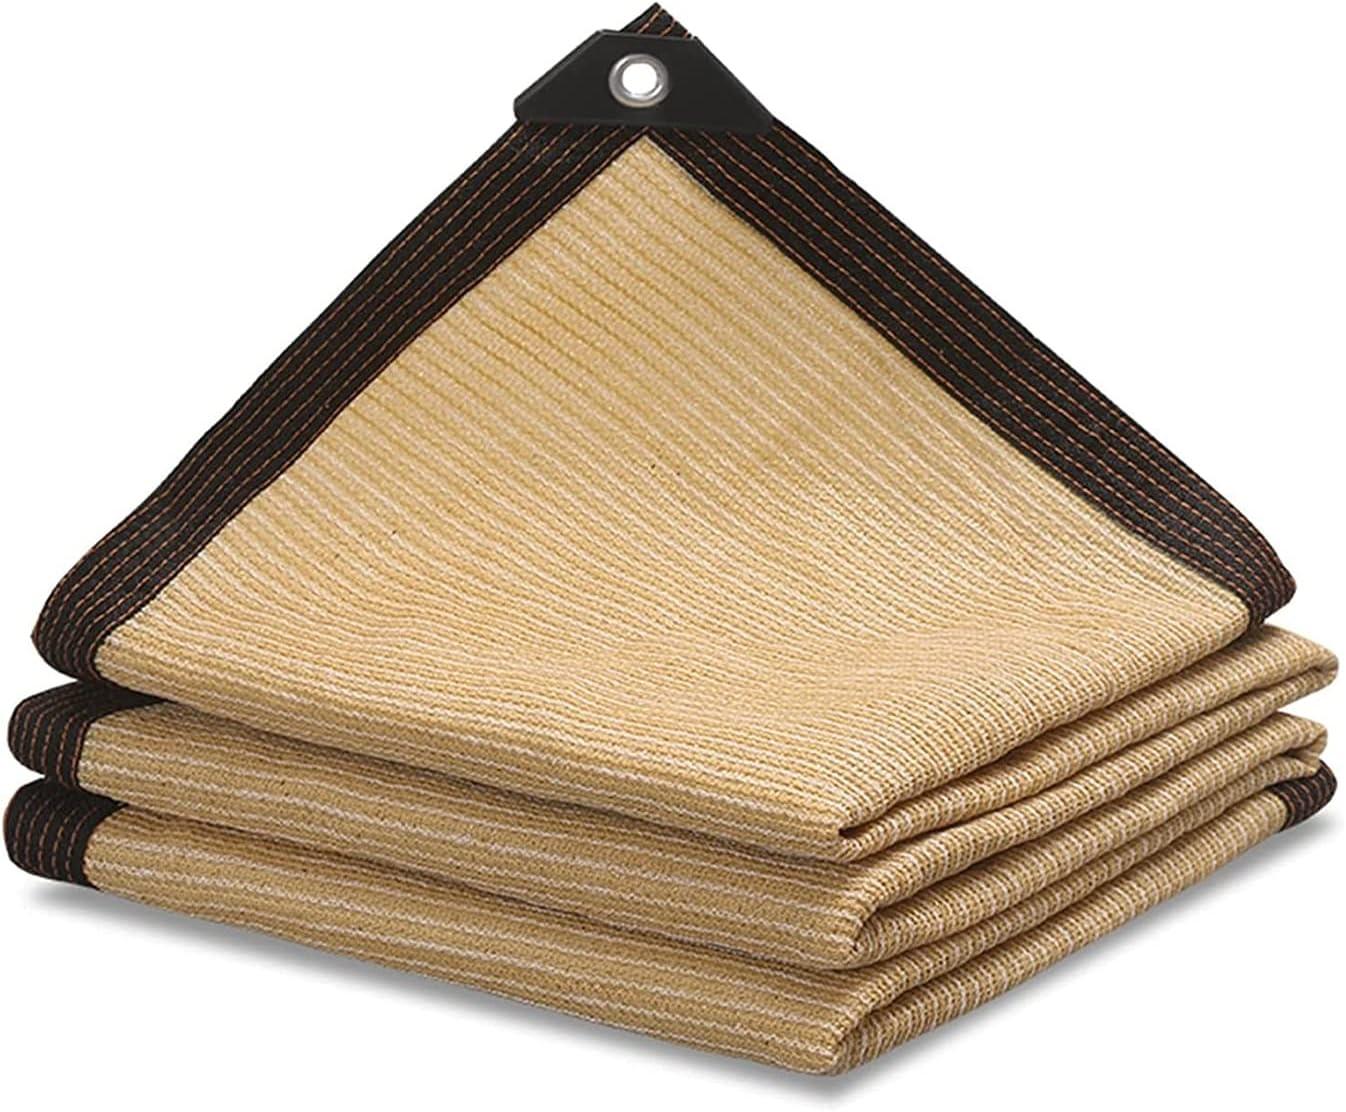 LLCY Shade Cloth Beige Sunblock UV Max 82% OFF Edge Cut Resista Trust